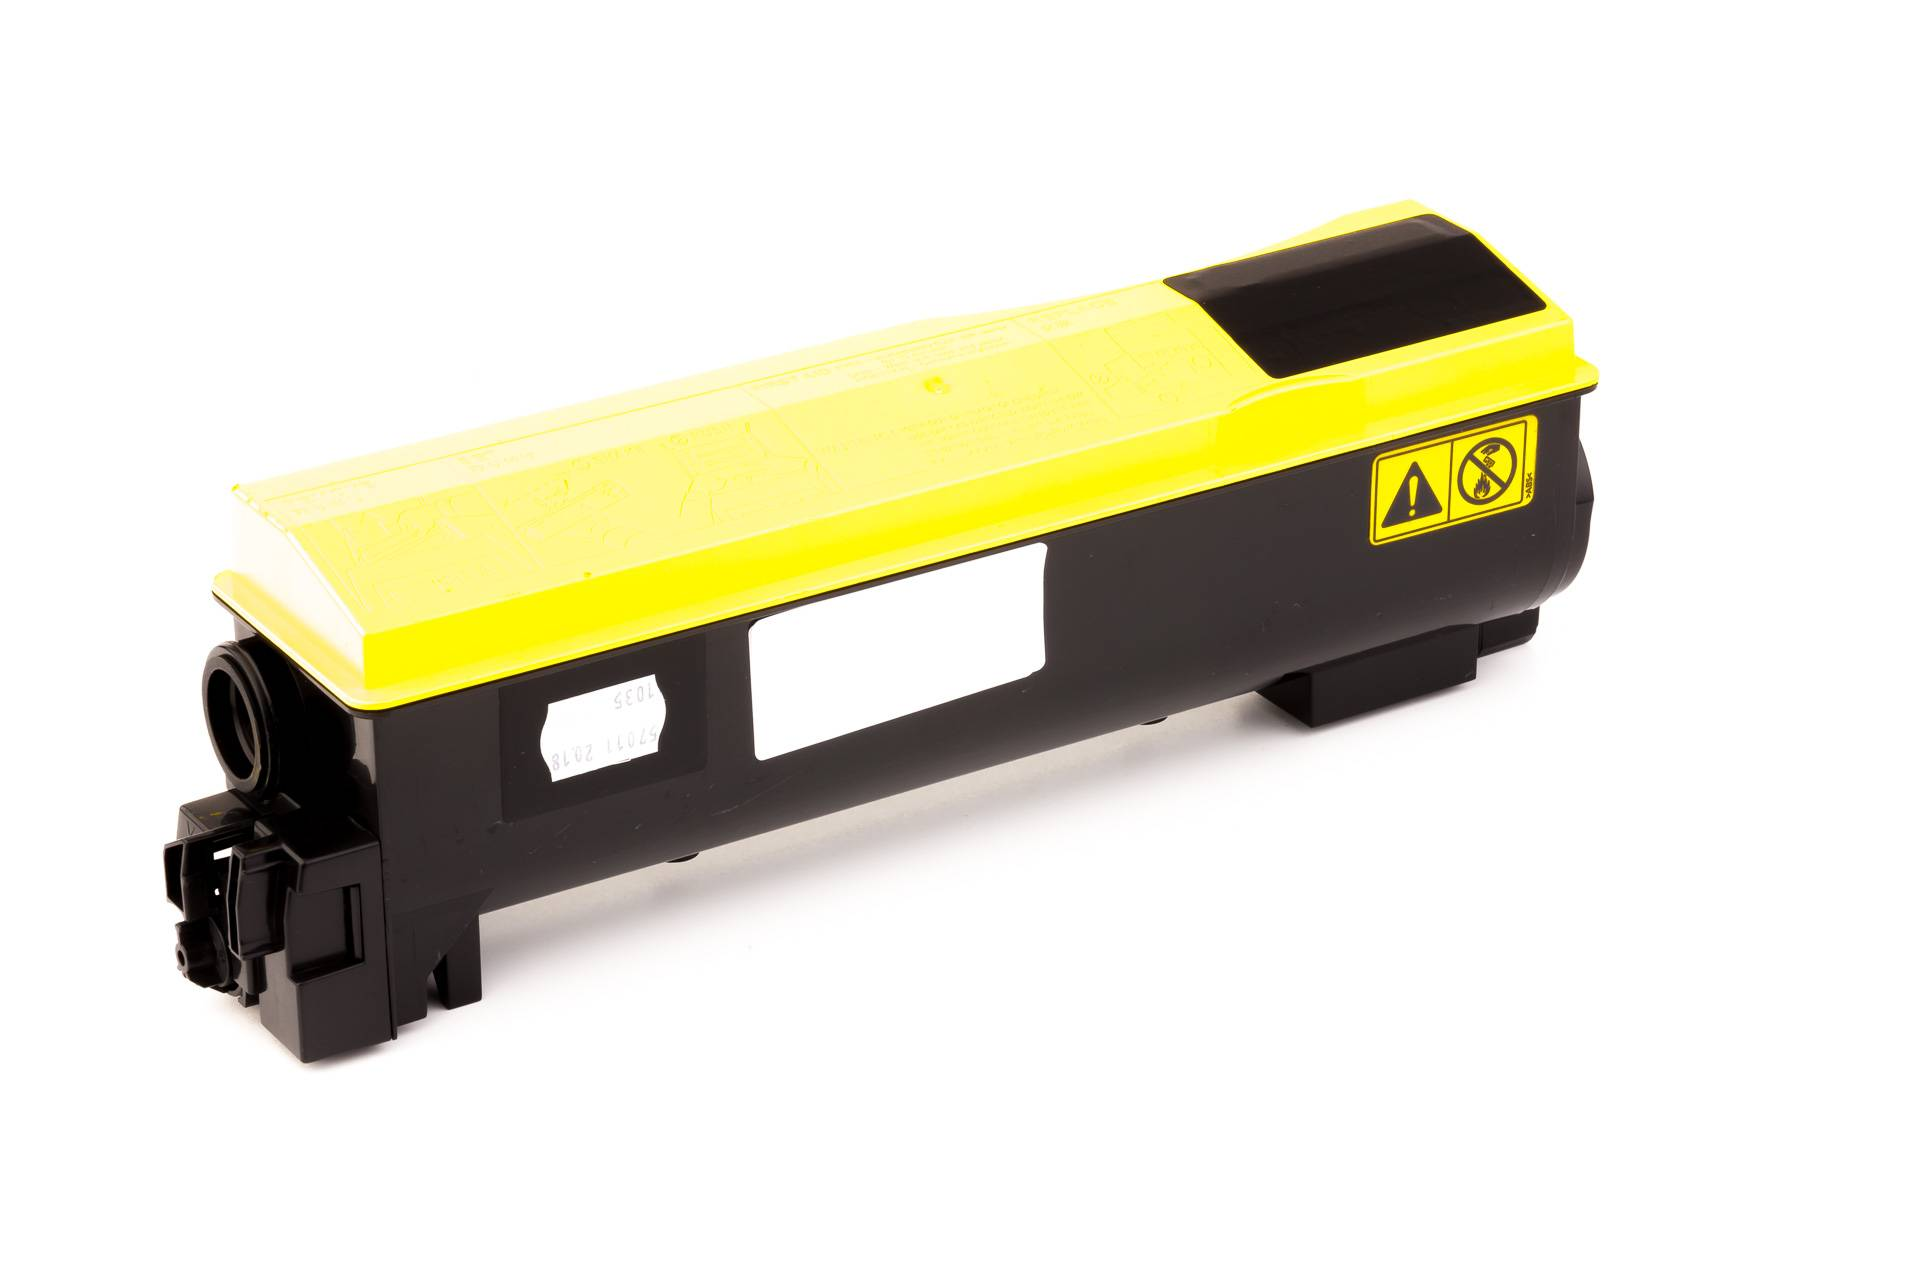 Kyocera Cartouche de Toner pour Kyocera 1T02HGAEU0 / TK-570 Y jaune compatible (de marque ASC)